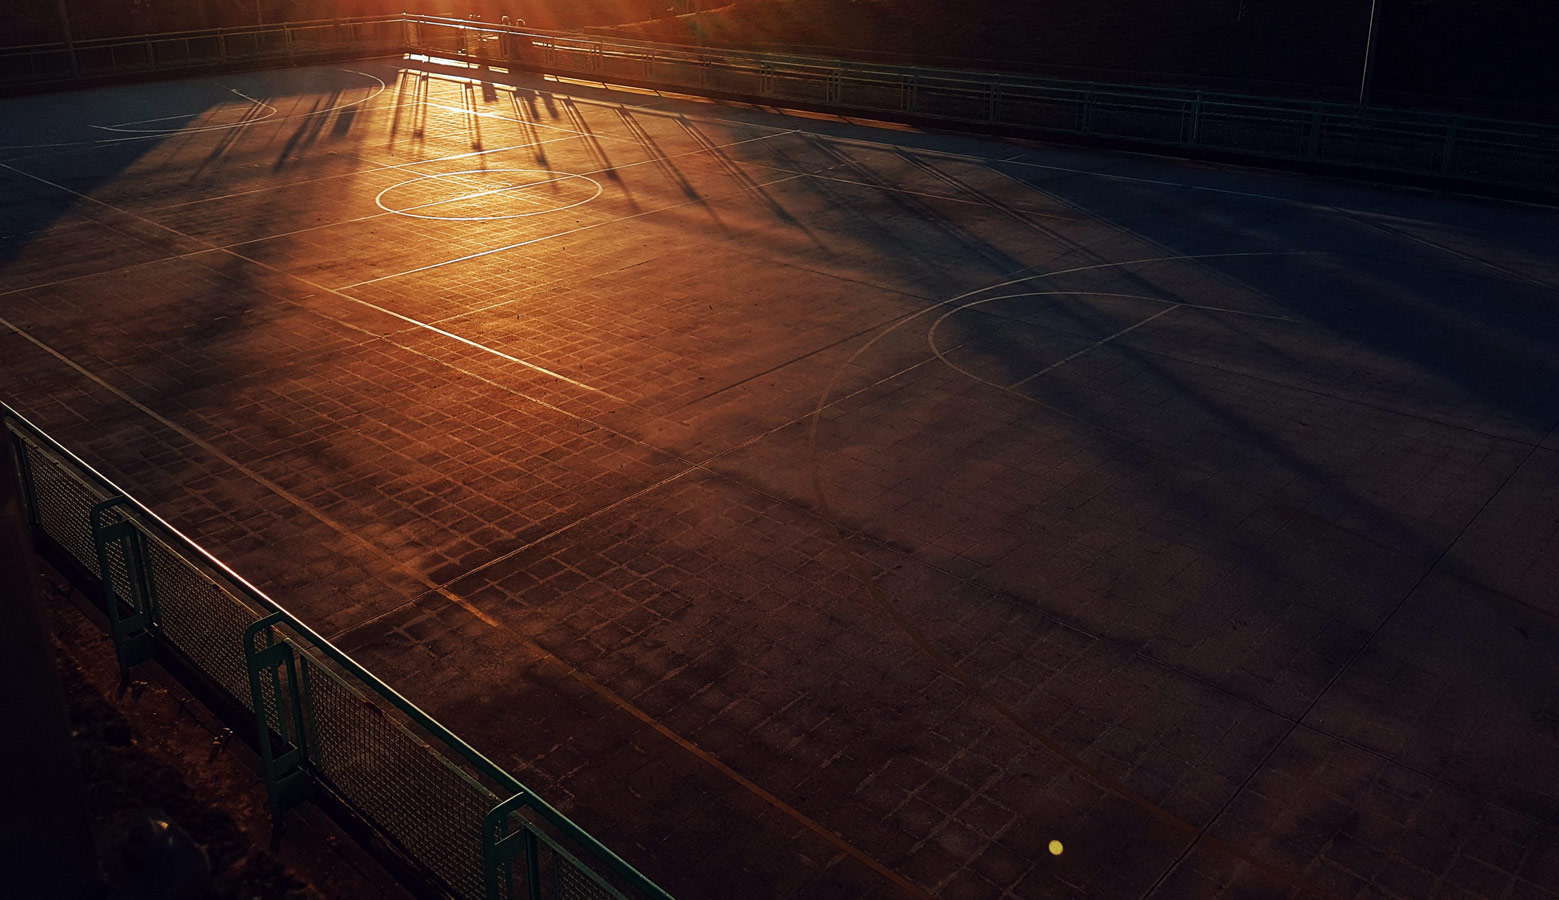 © Benocci Federico, FIBA Photo Contest